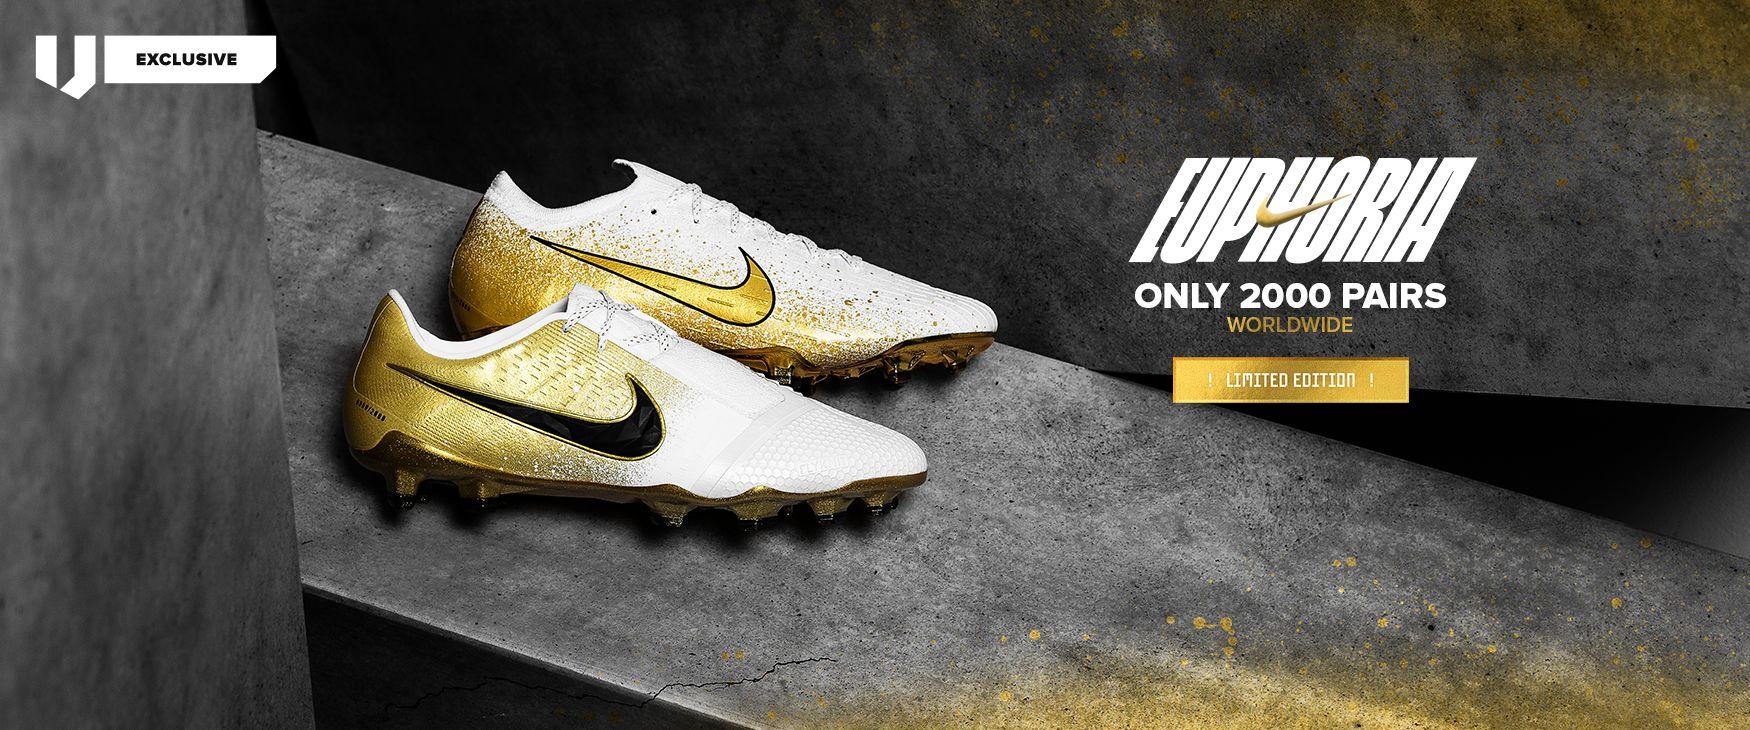 new concept 673a6 8ea0e Unisportstore.com - Football boots and Football shirts online